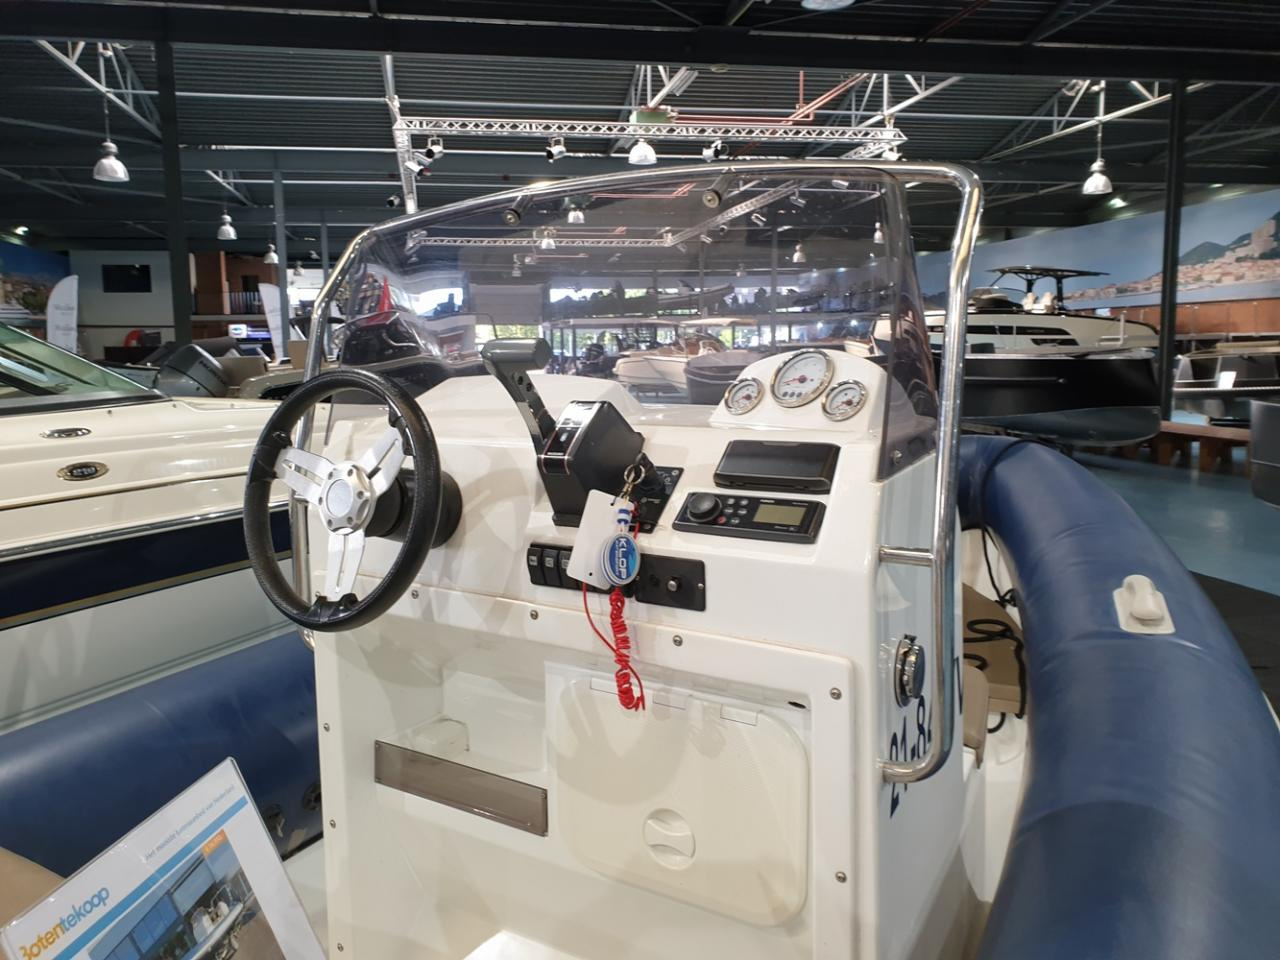 Roughneck 550 rib met Suzuki 90 pk en trailer 8